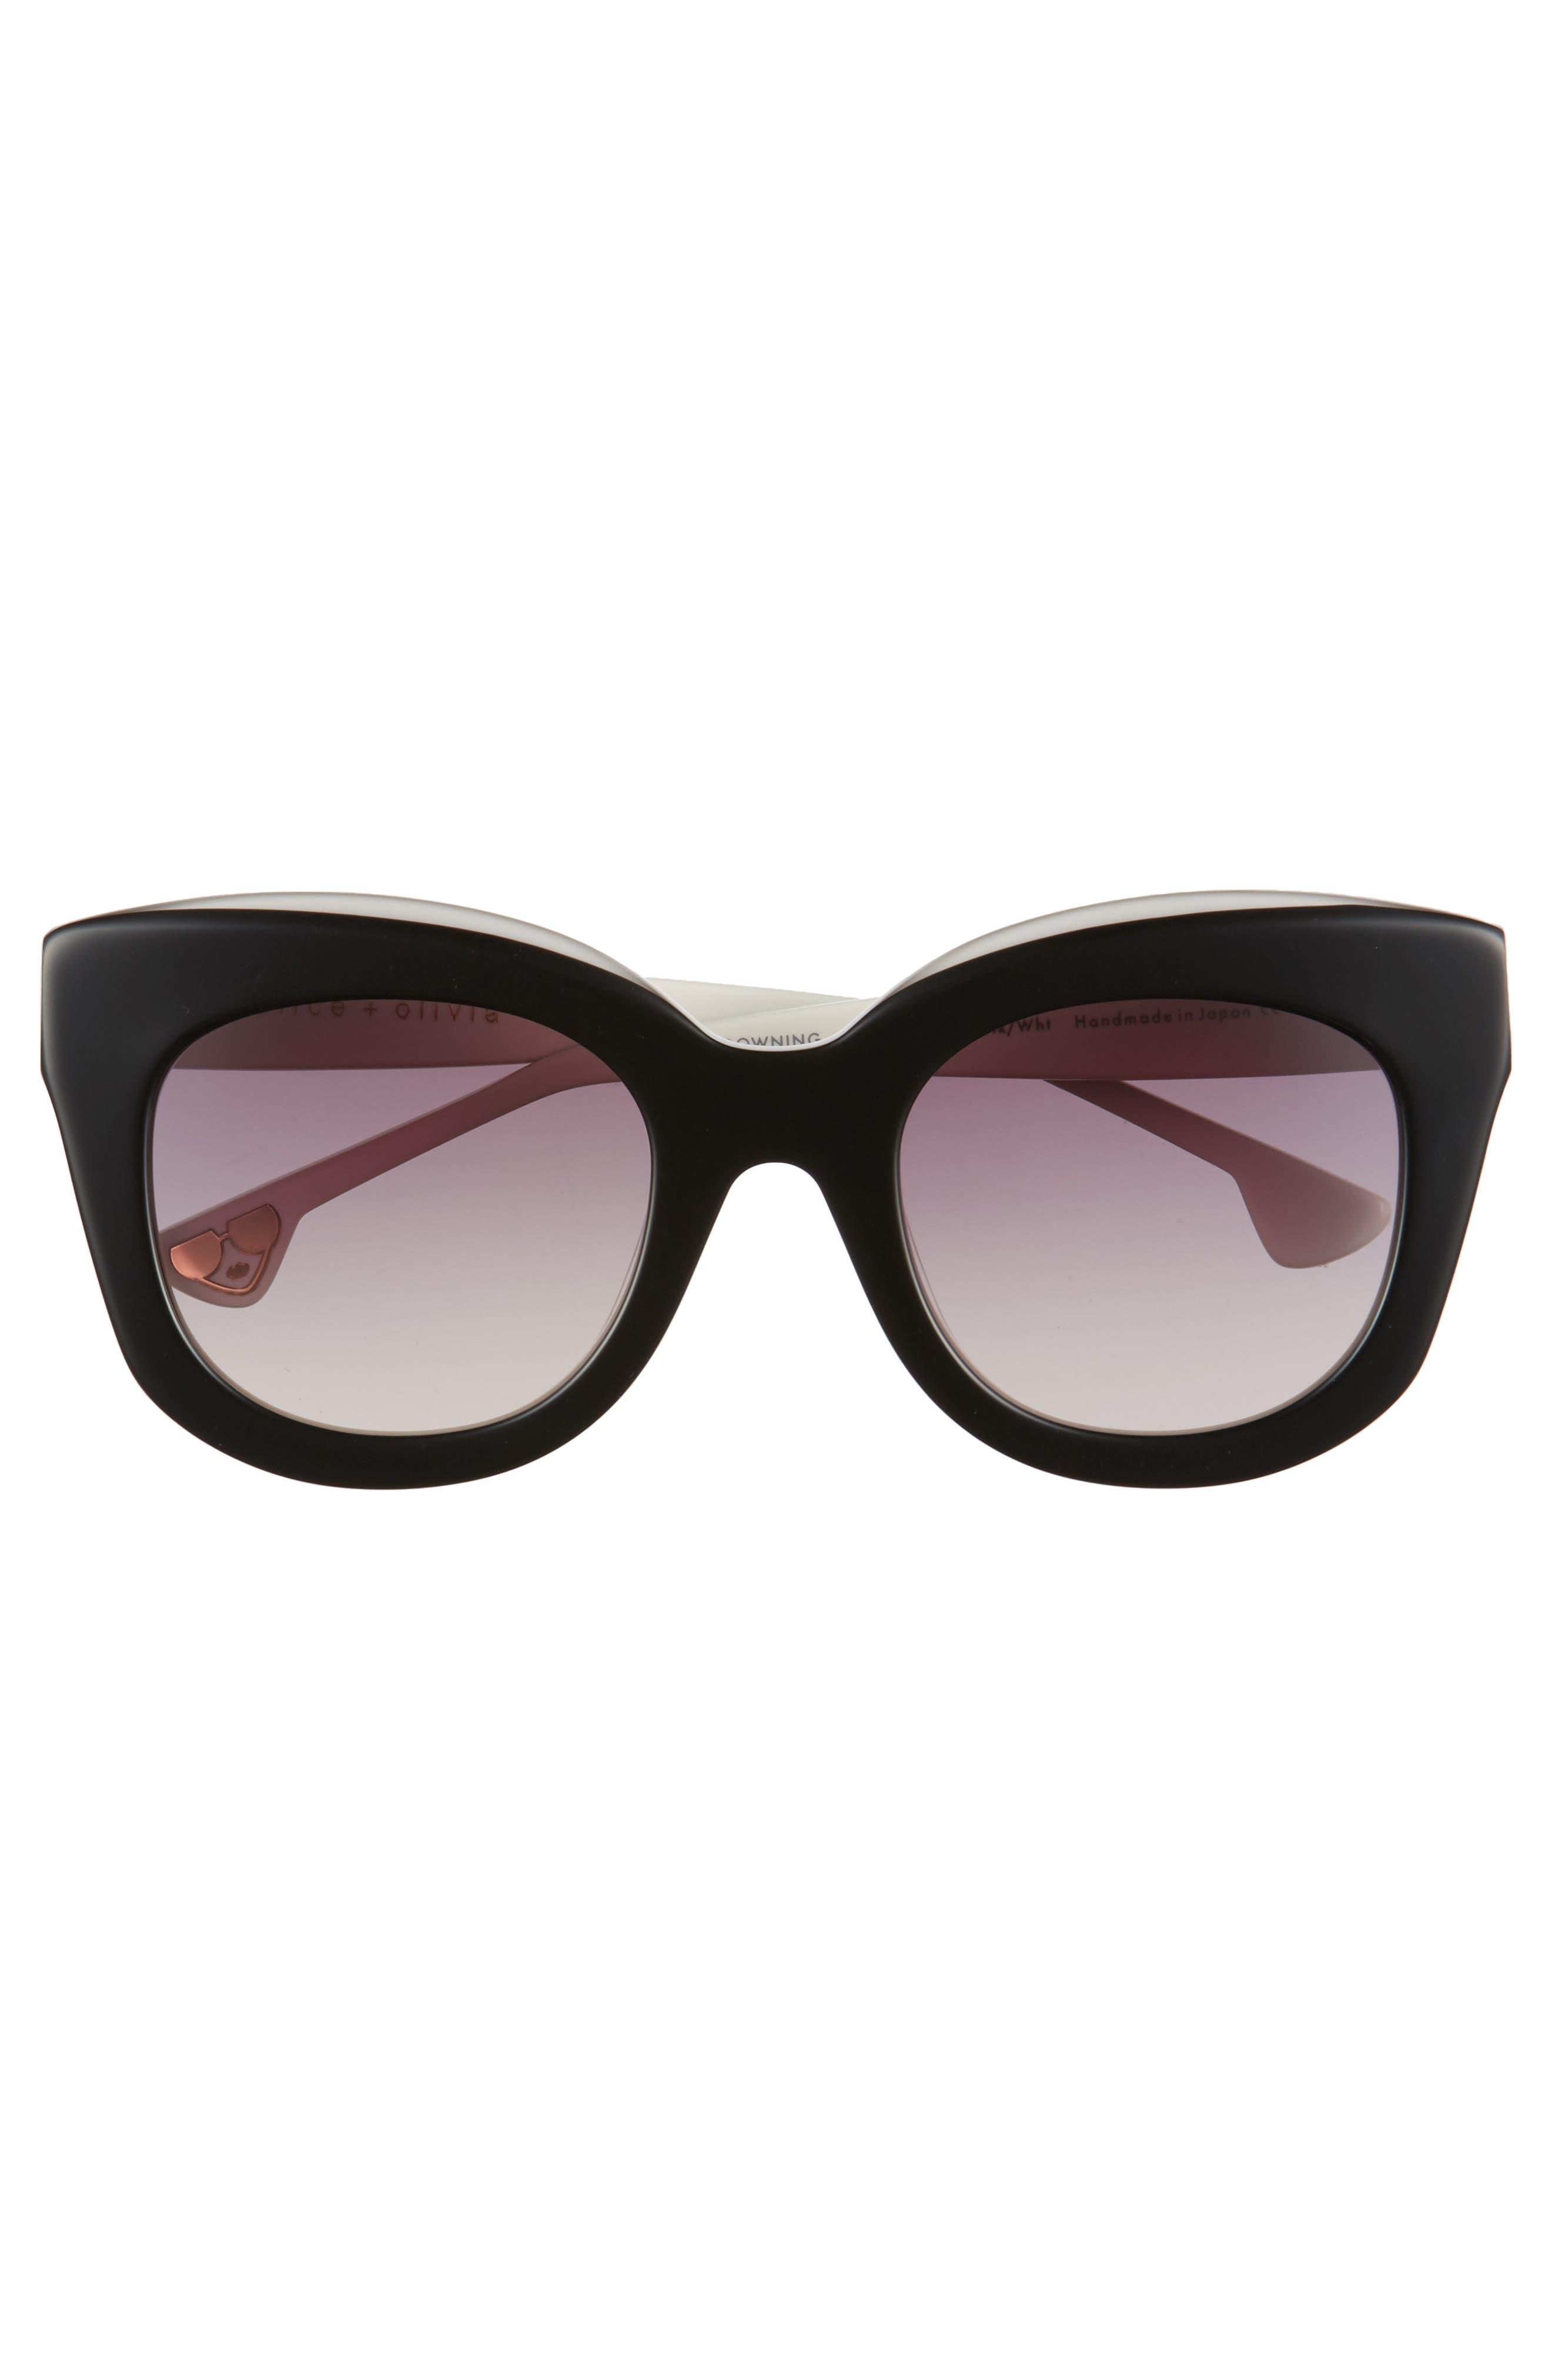 Downing 51mm Cat Eye Sunglasses,                             Alternate thumbnail 3, color,                             001